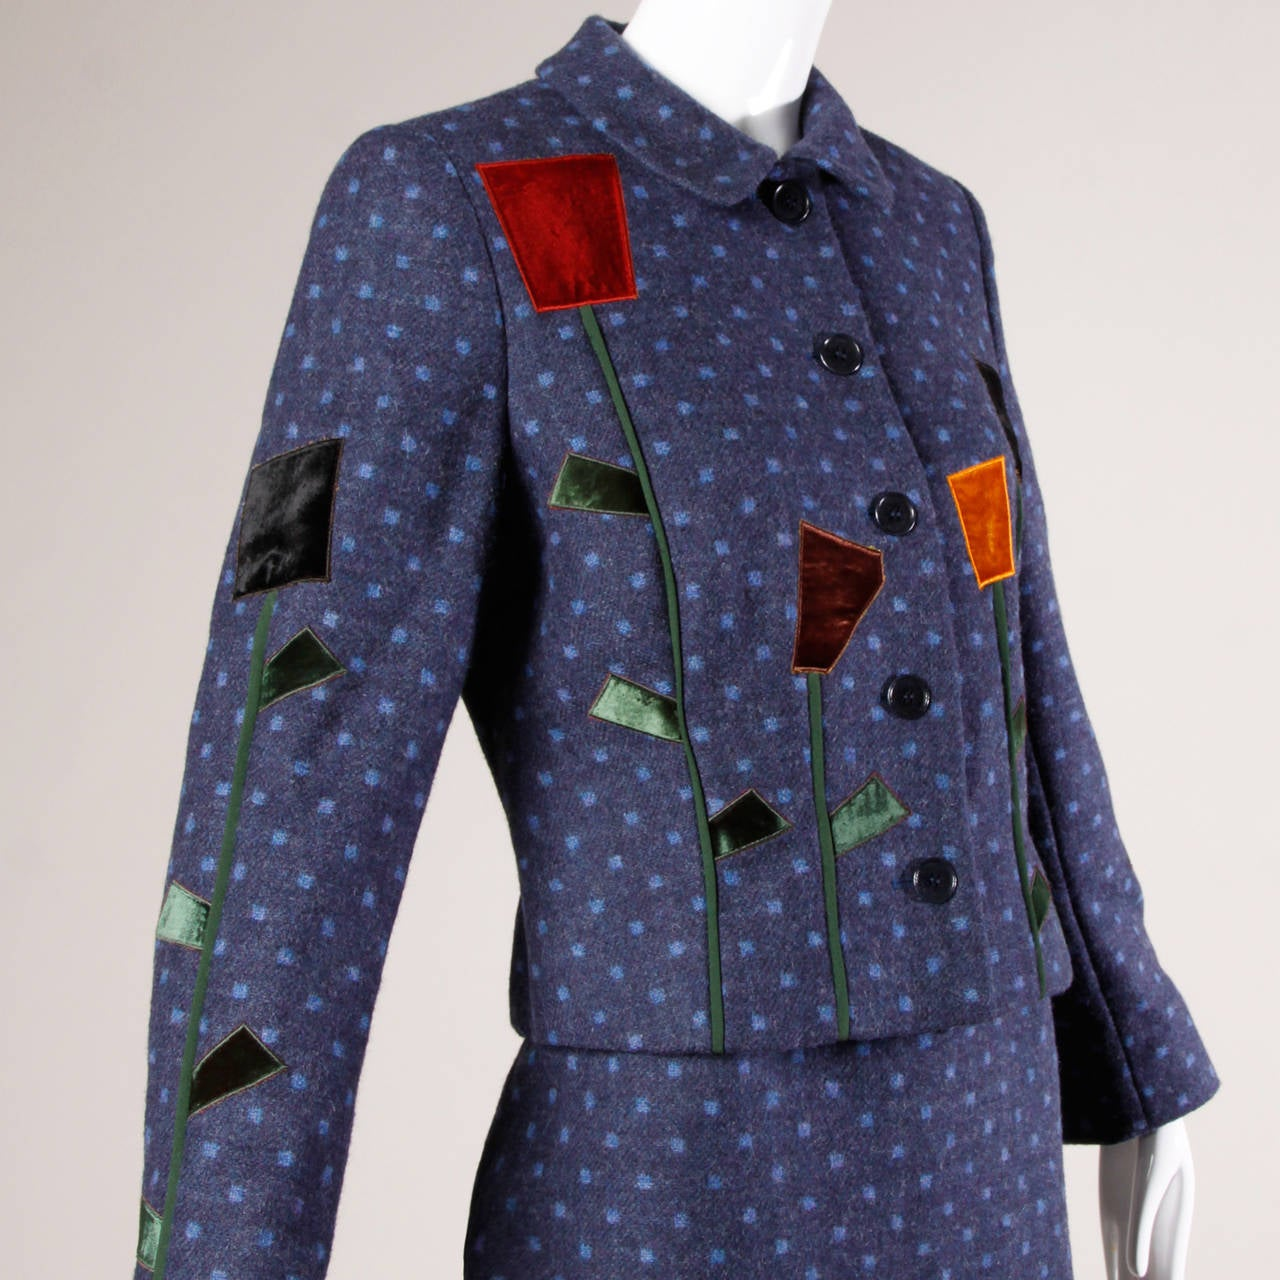 Black Moschino Vintage 90s Polka Dot Patchwork Skirt + Jacket Suit Ensemble For Sale